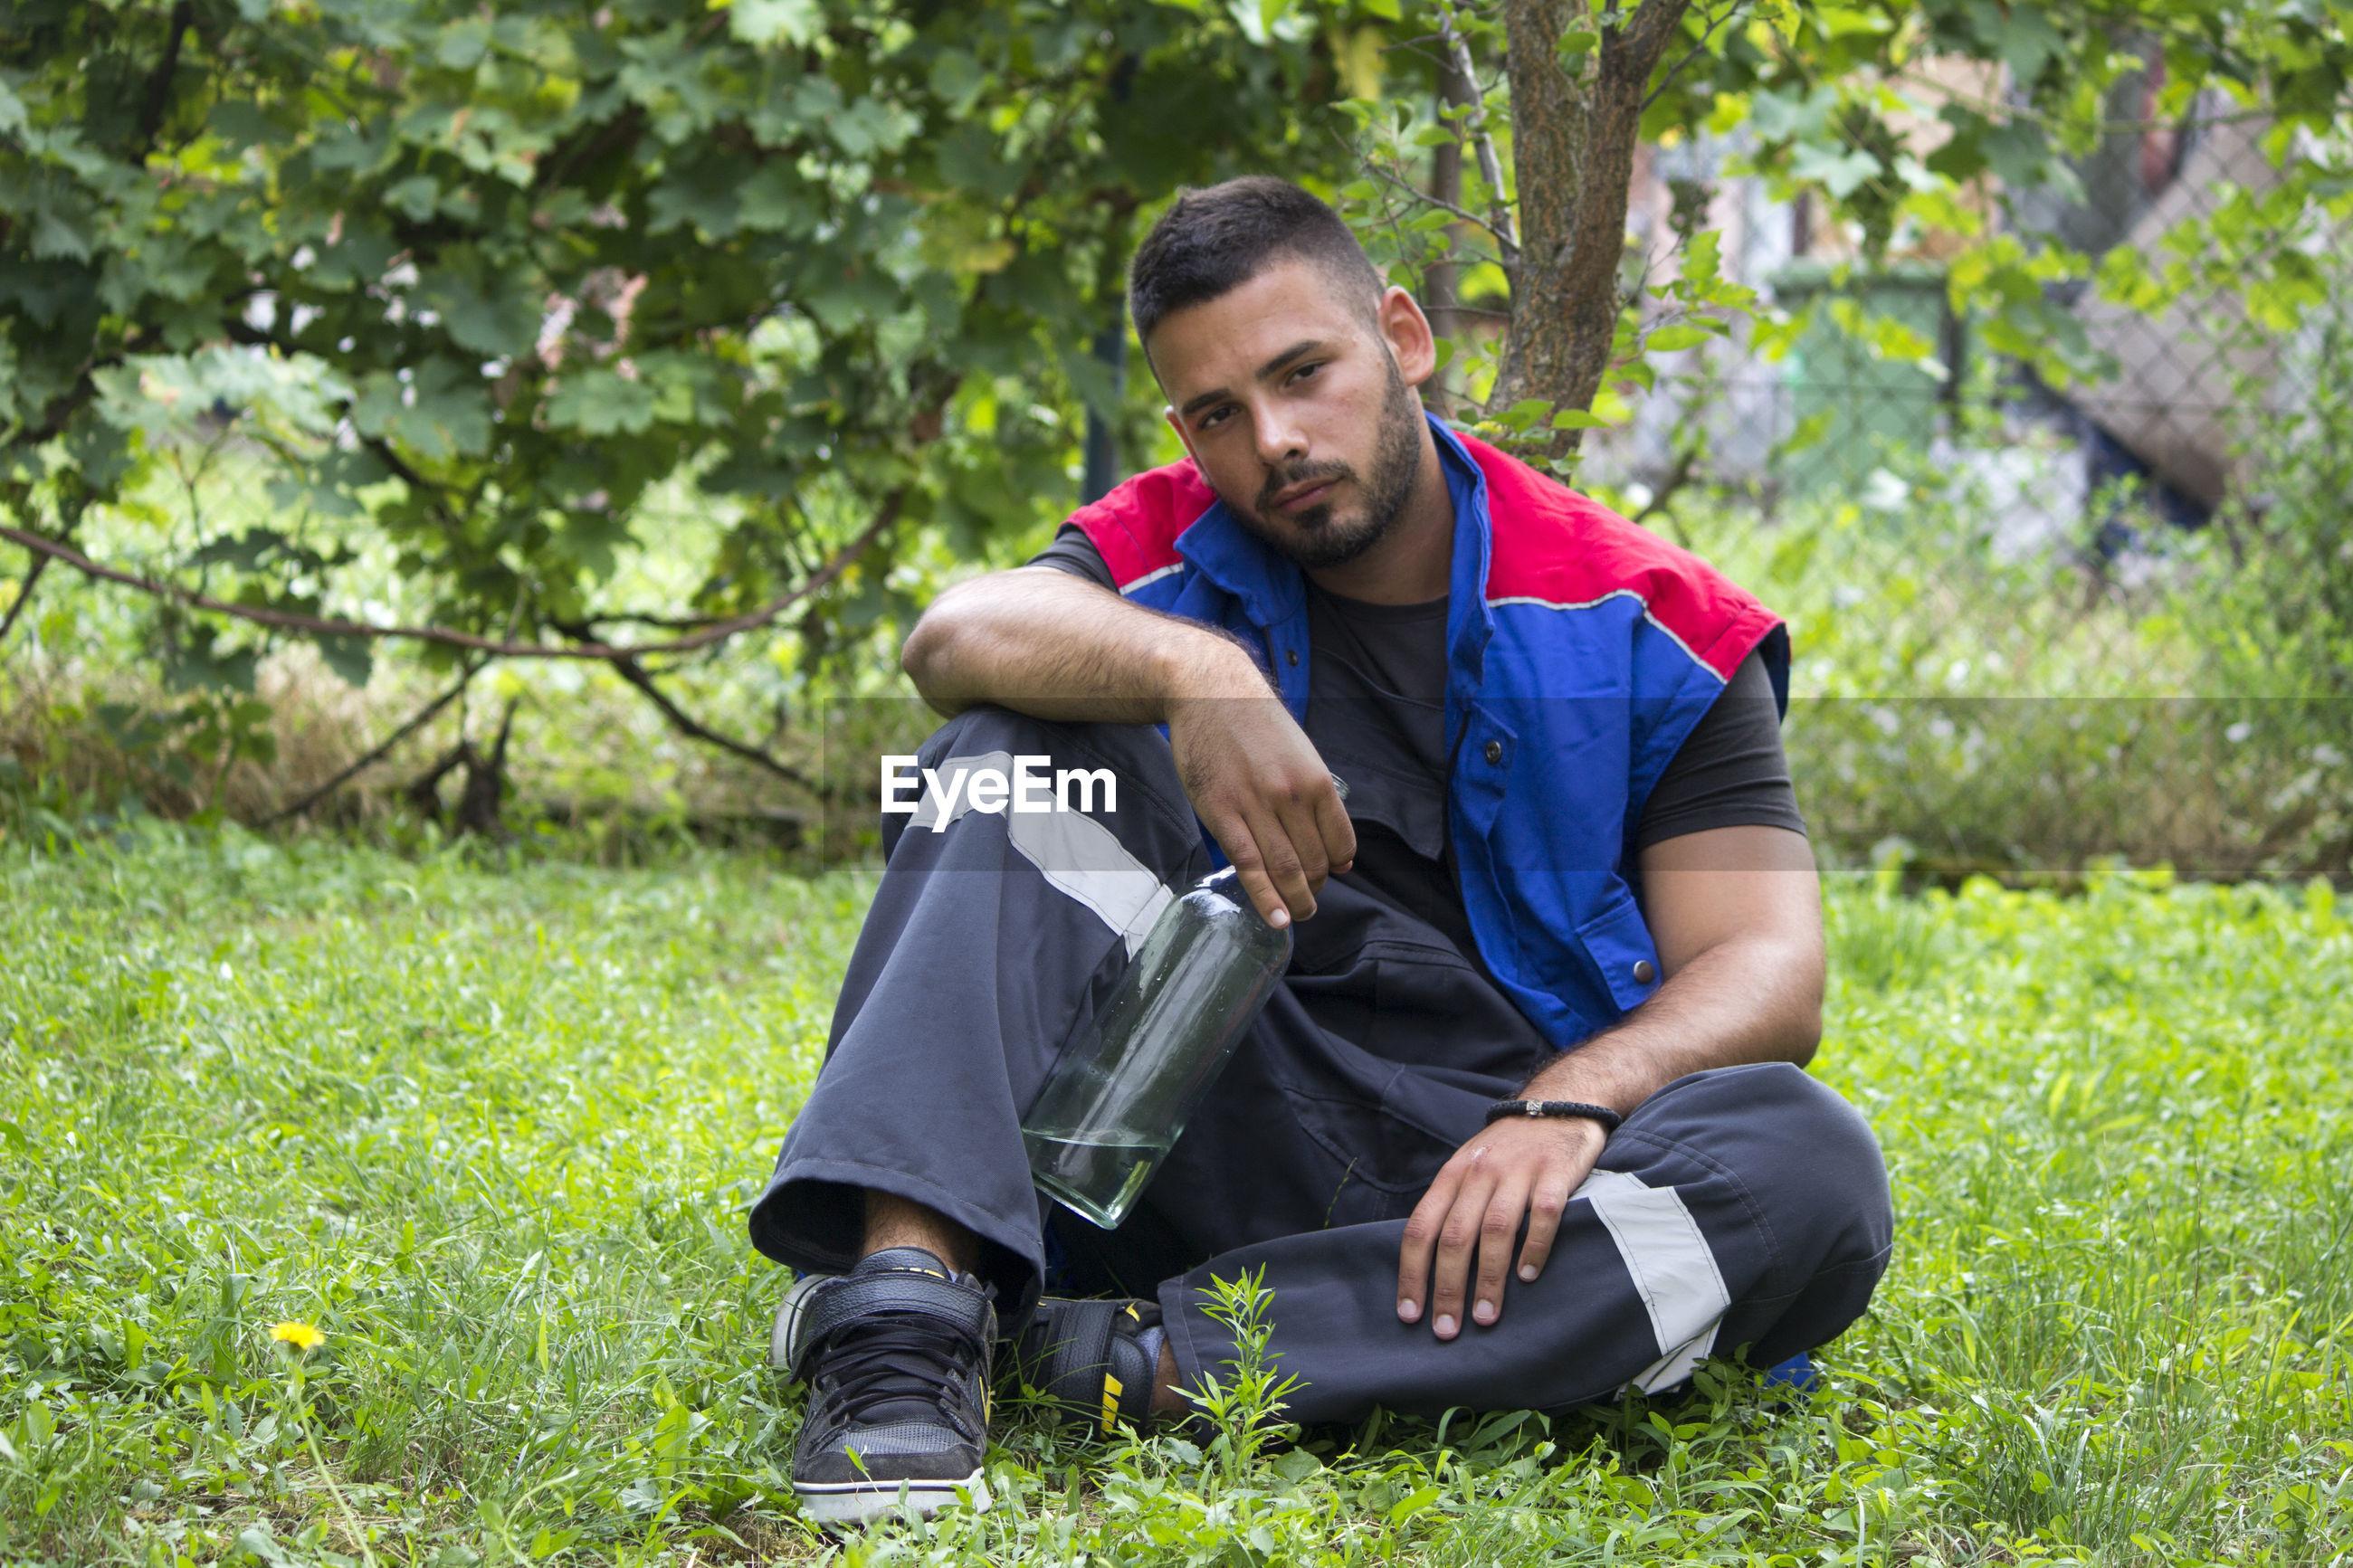 Portrait of man sitting on grass land